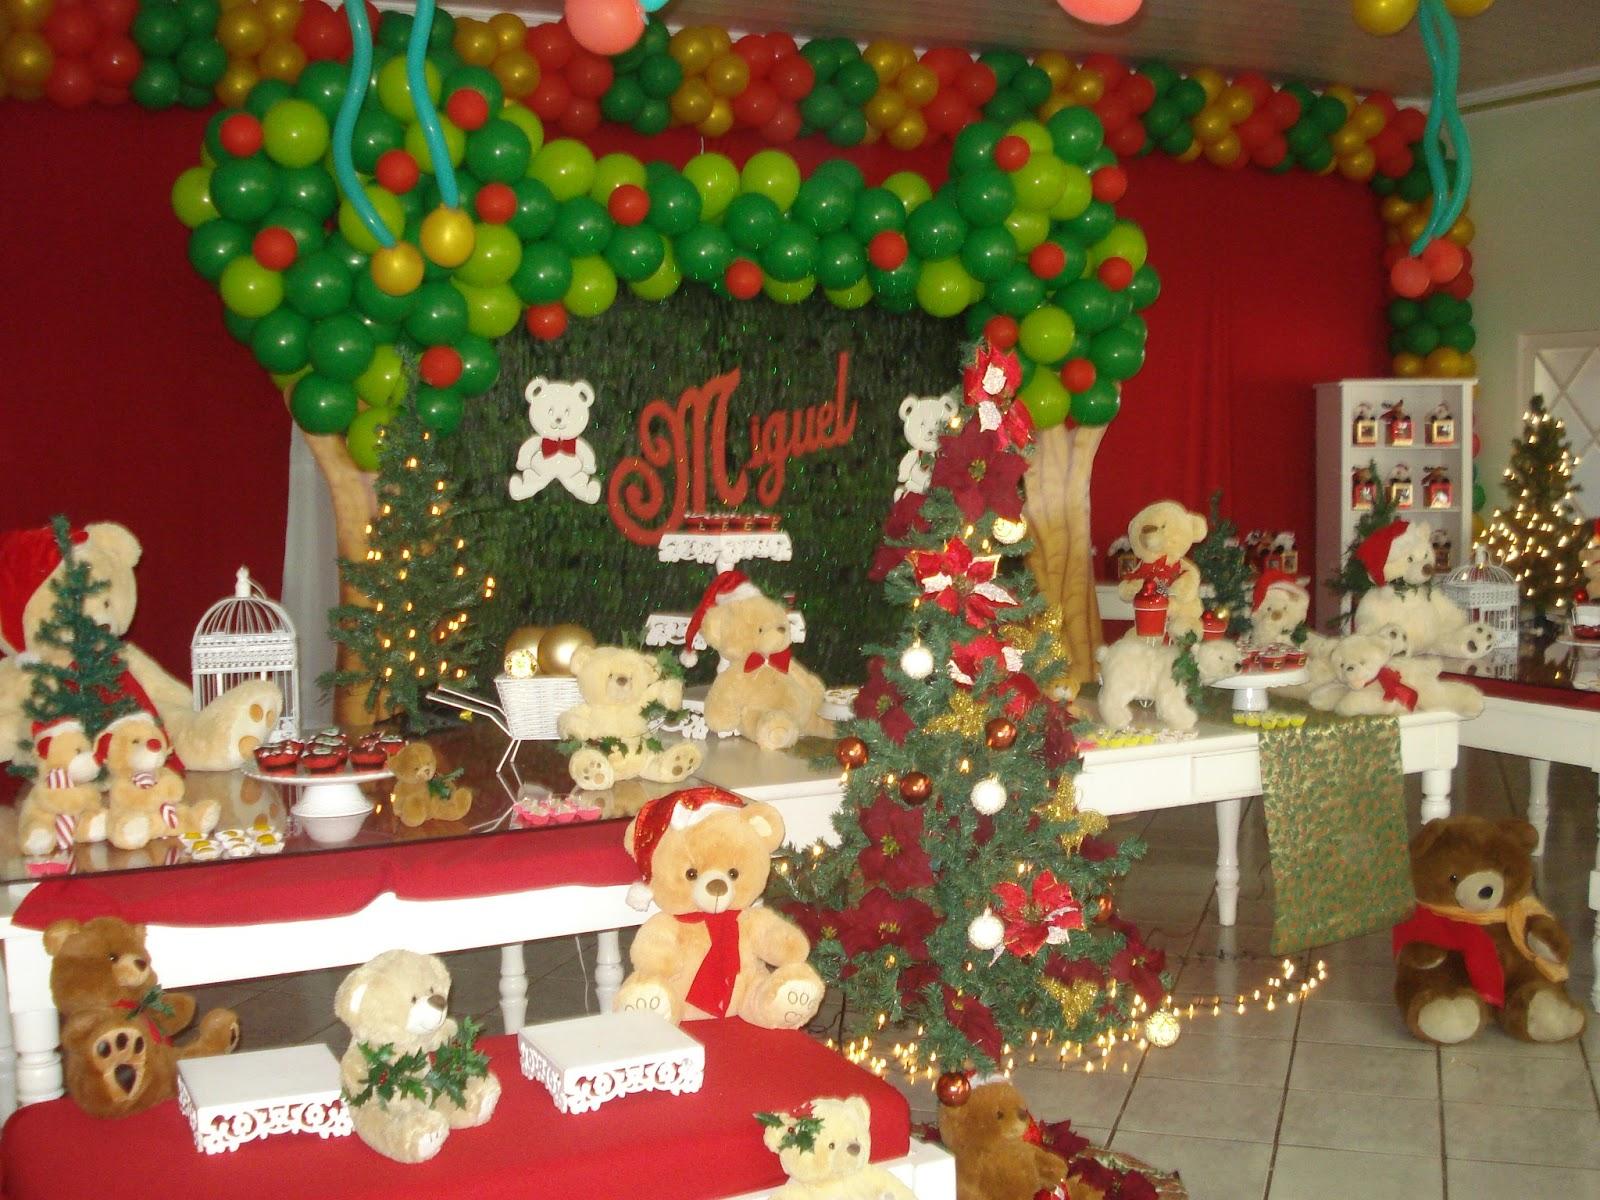 decoracao festa natal:Decoracao De Natal Para Festa Aniversario